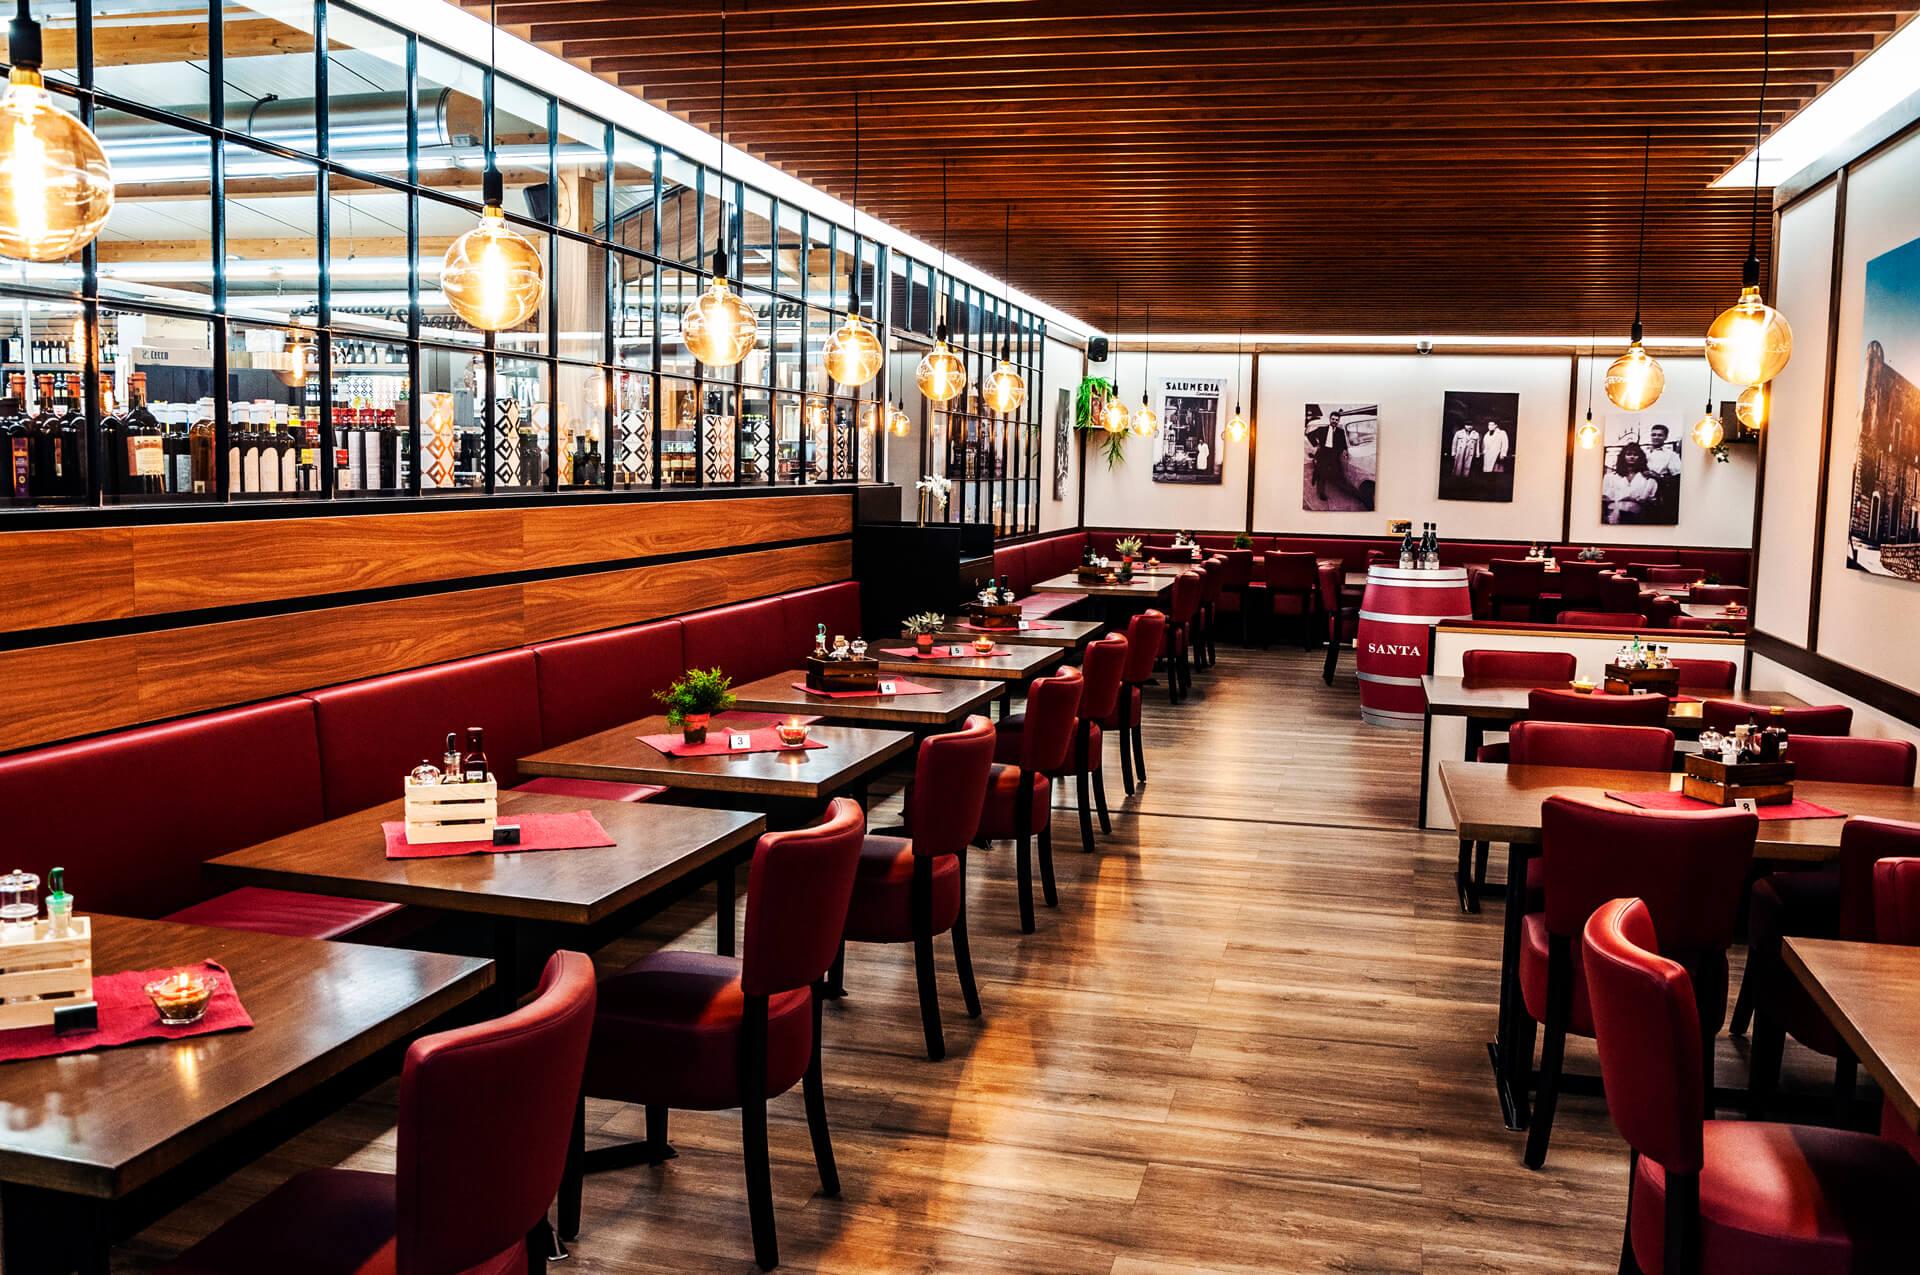 Da Tenace - Restaurant Tische innen 1-9